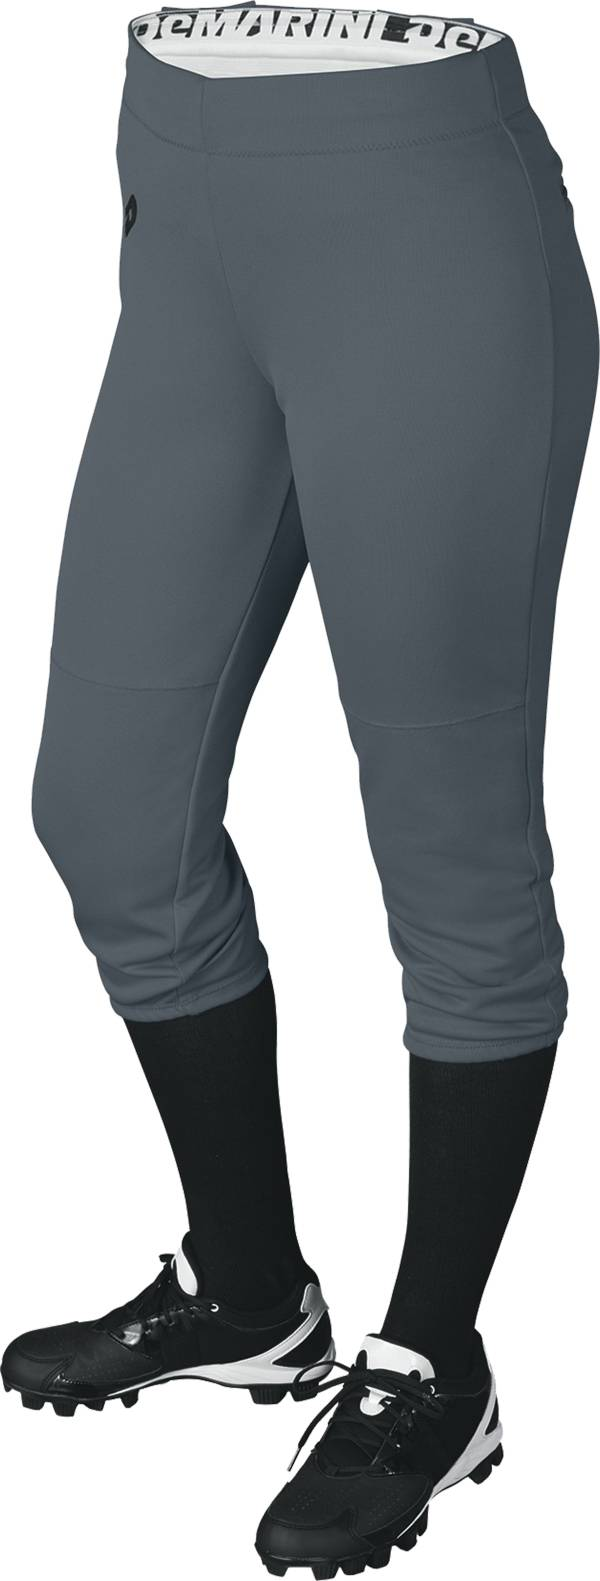 DeMarini Girls' Sleek Pull-Up Softball Pants product image